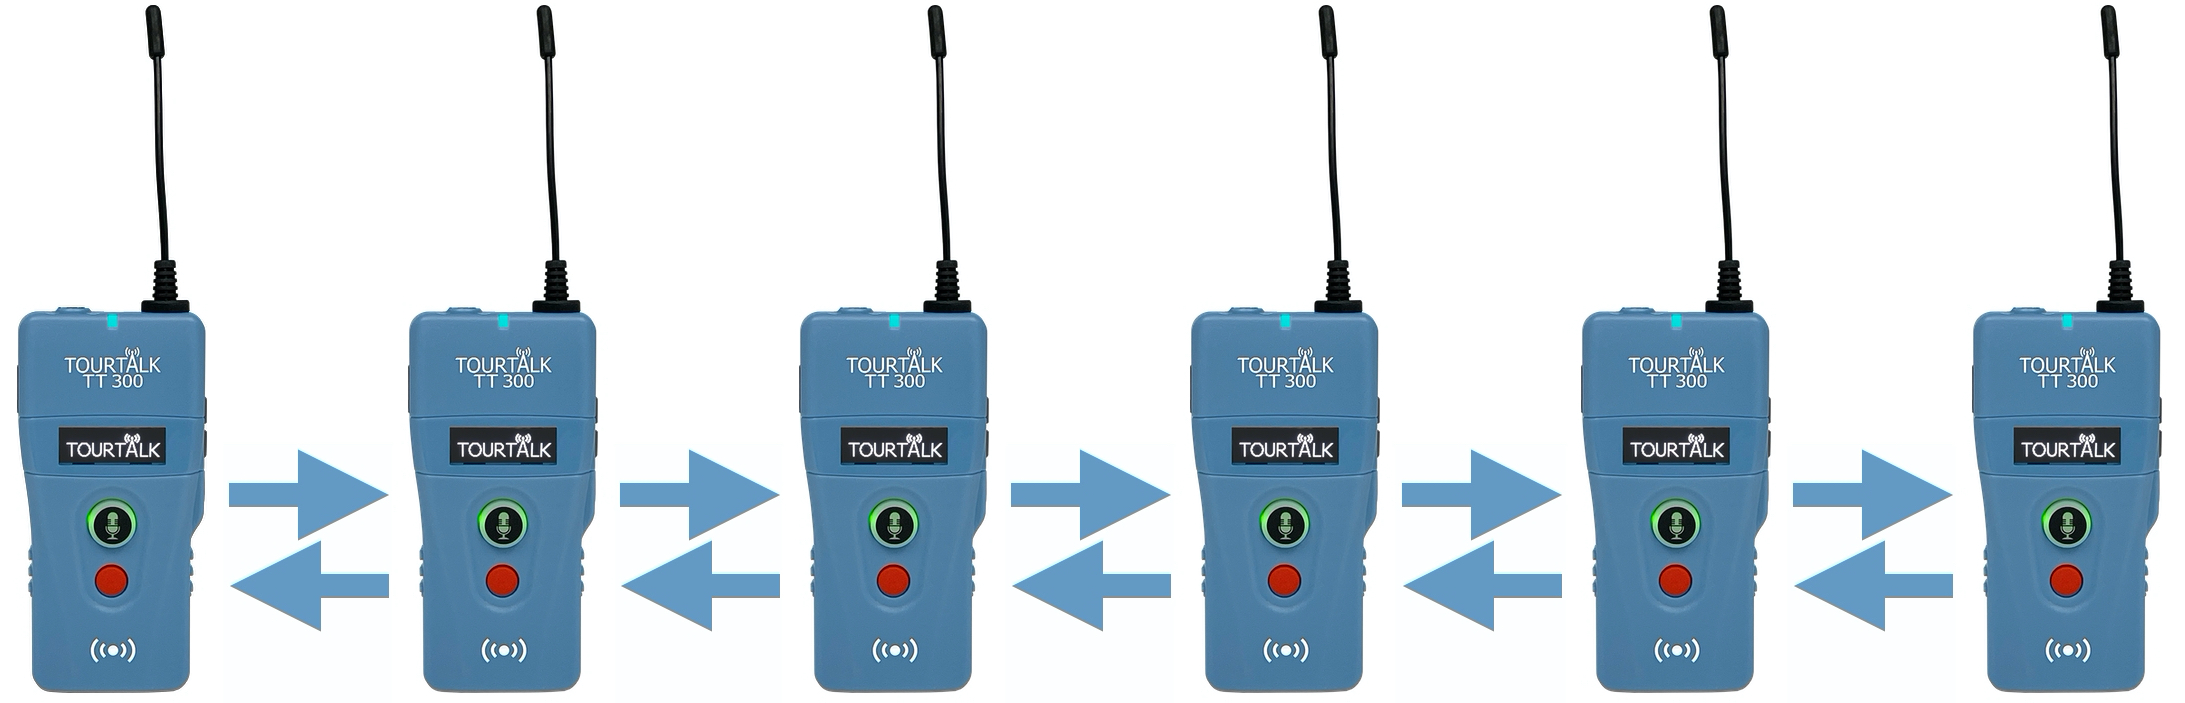 Tourtalk TT 300 six-way full-duplex communication system example